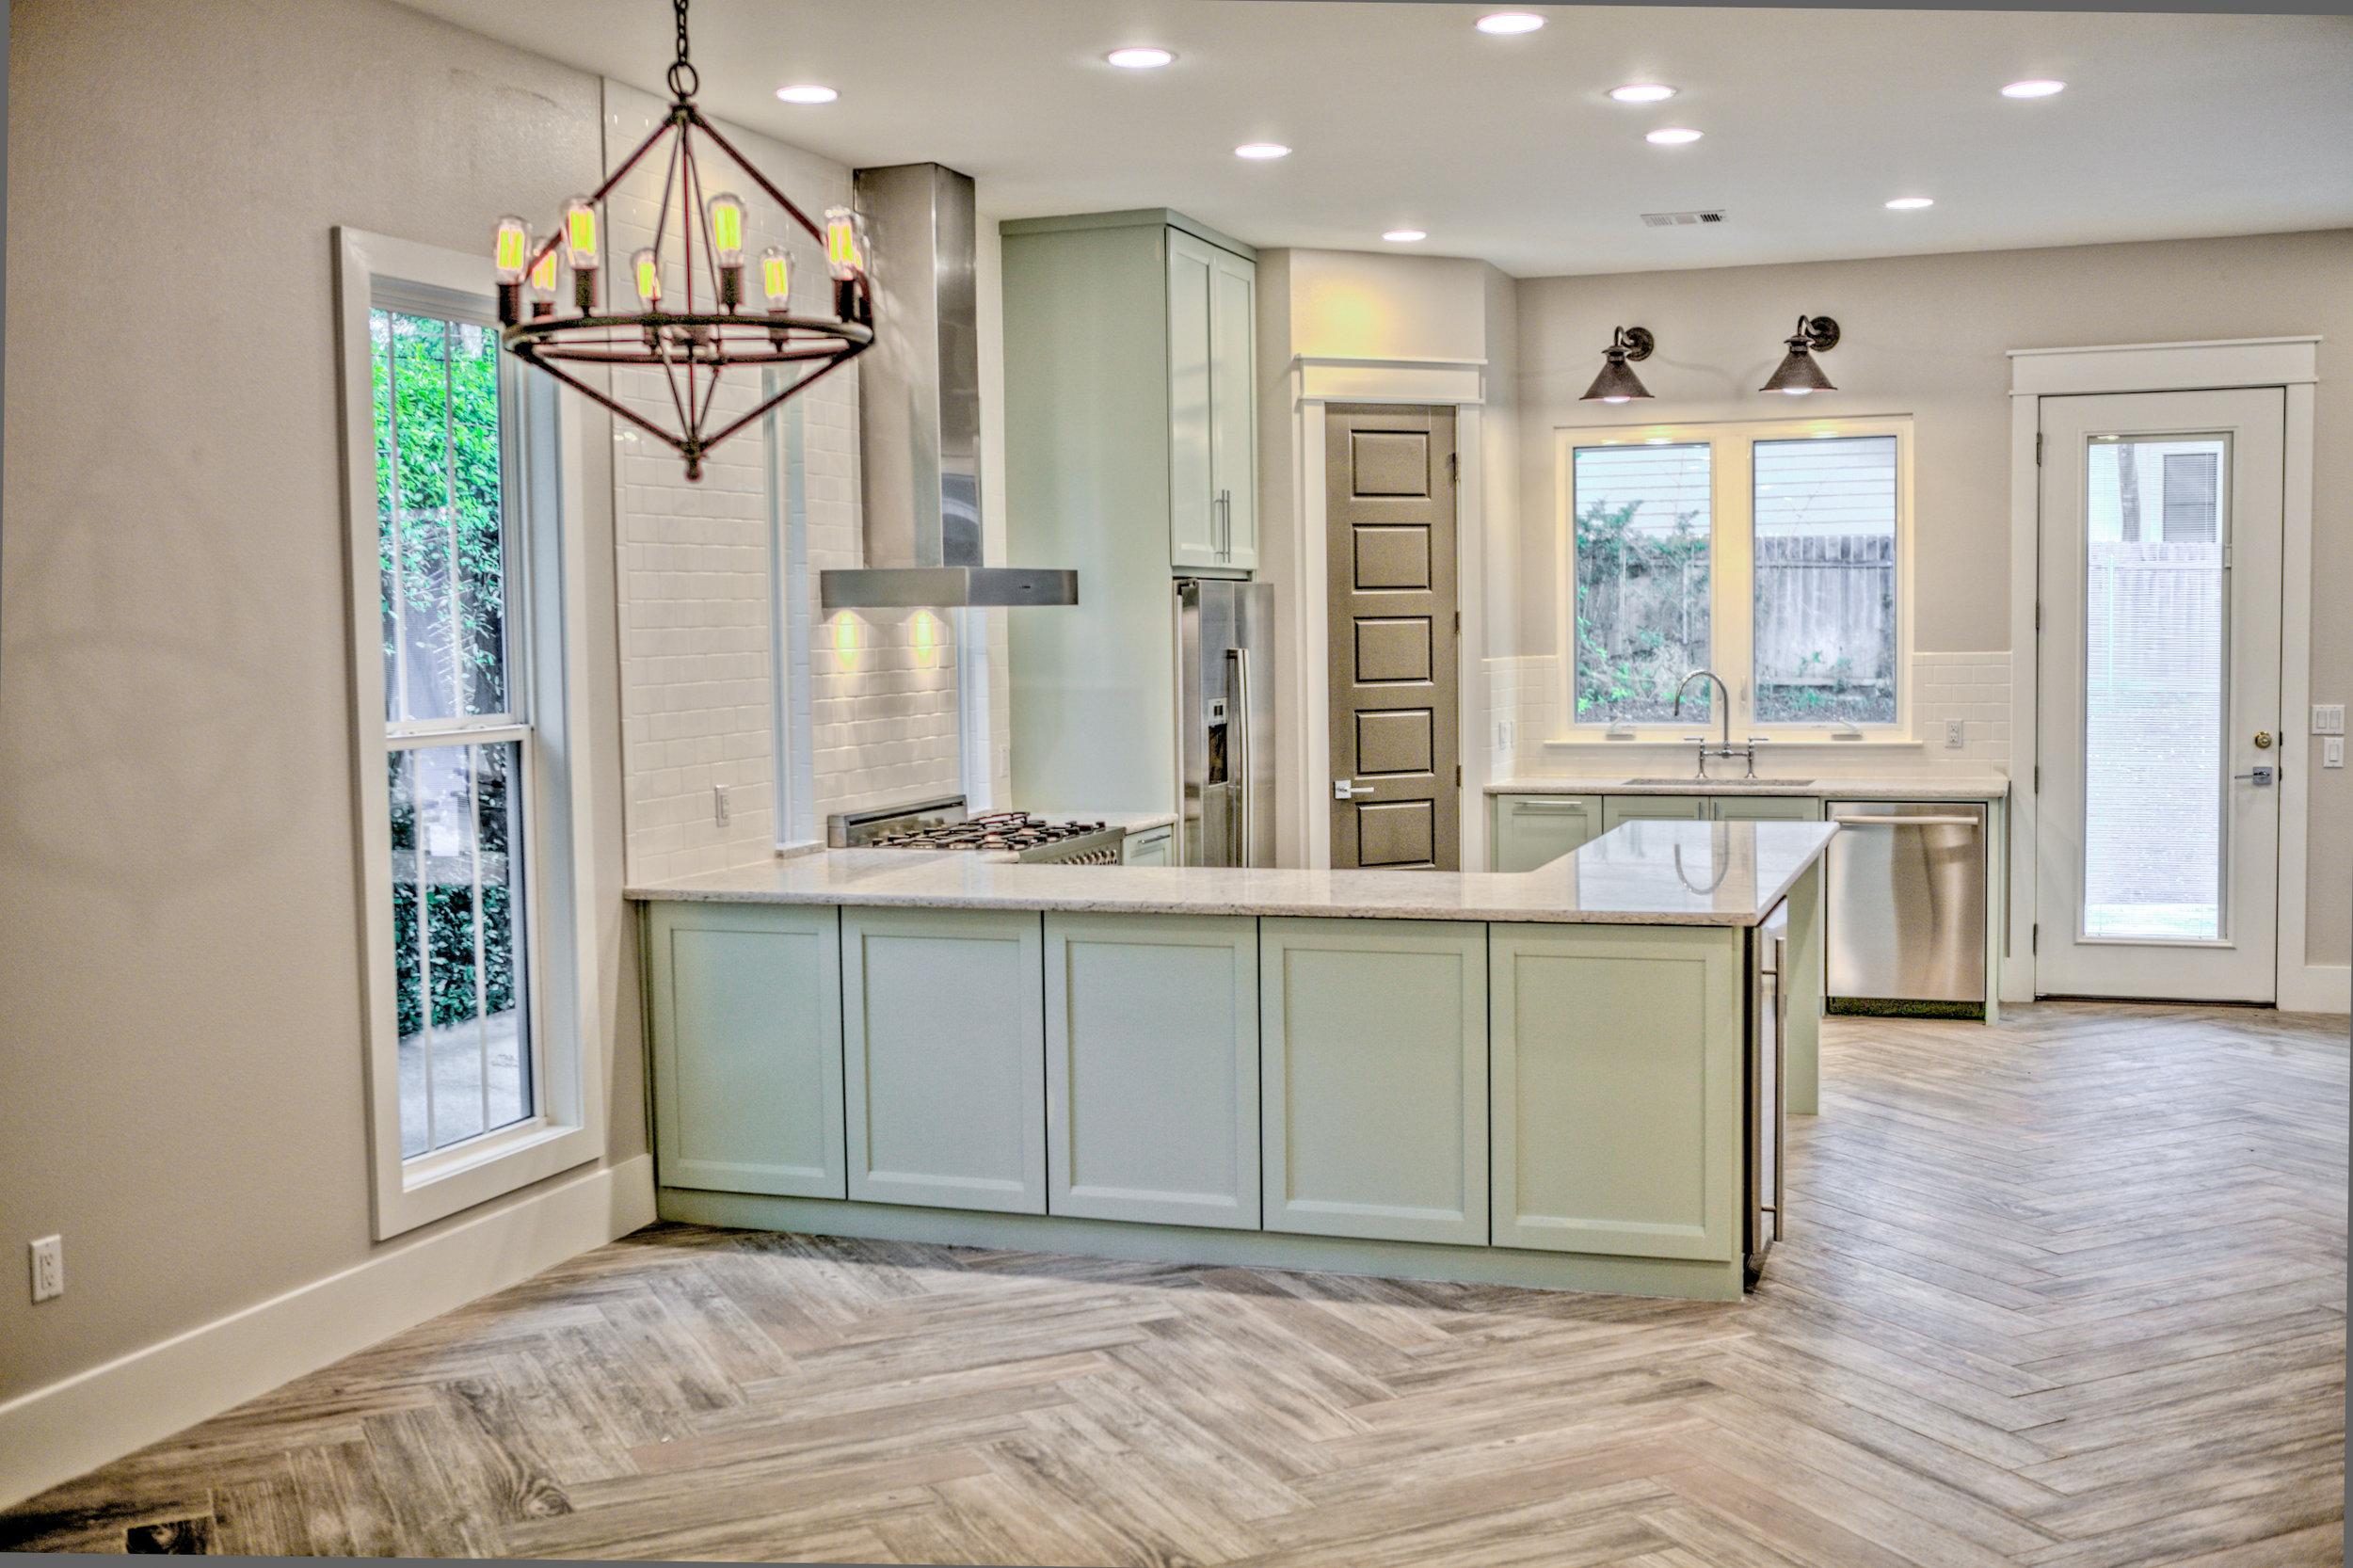 5 living_kitchen.jpg